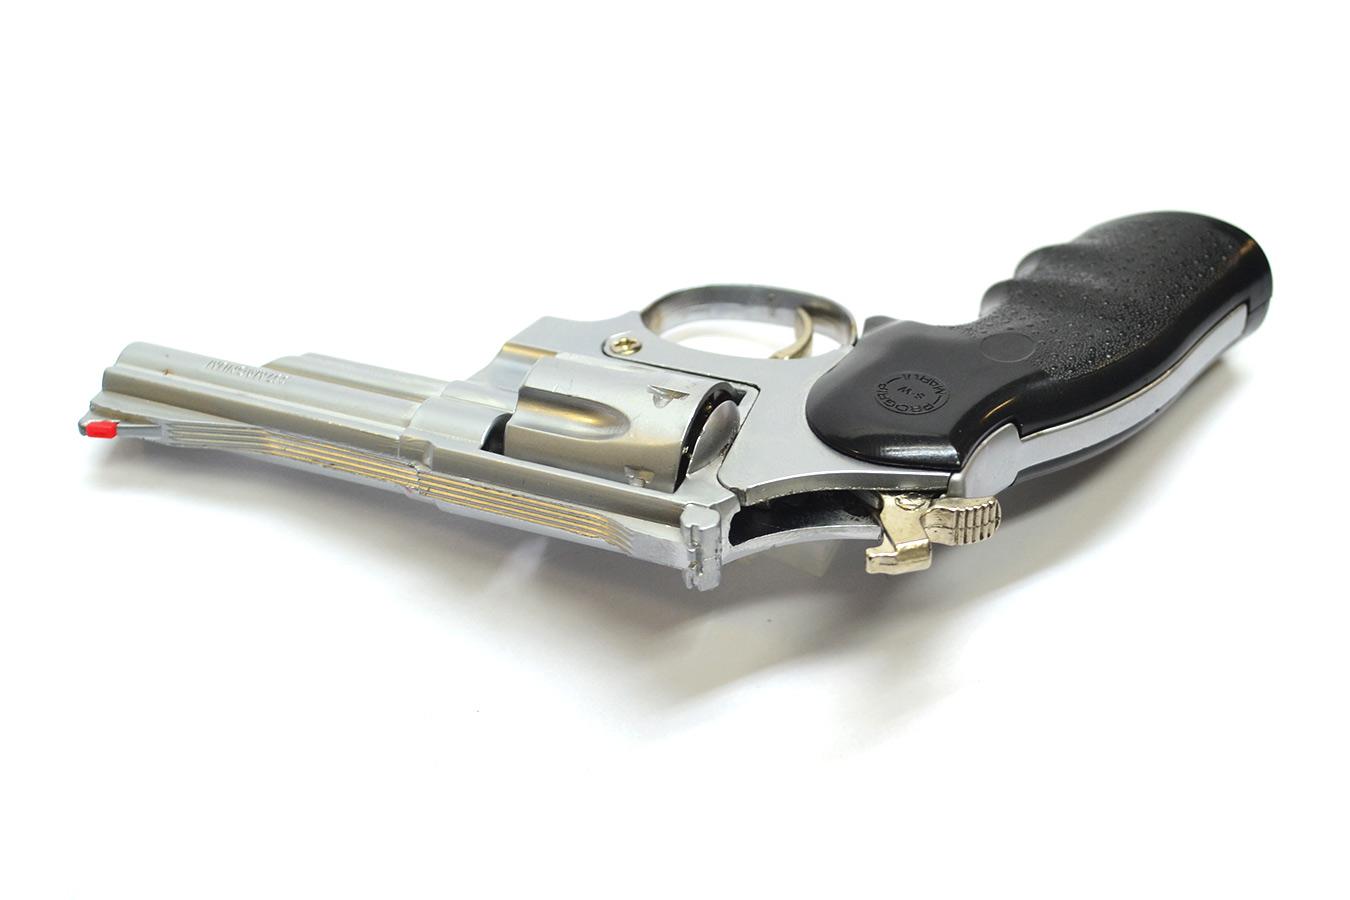 Smith & Wesson Model 29 изображение 3